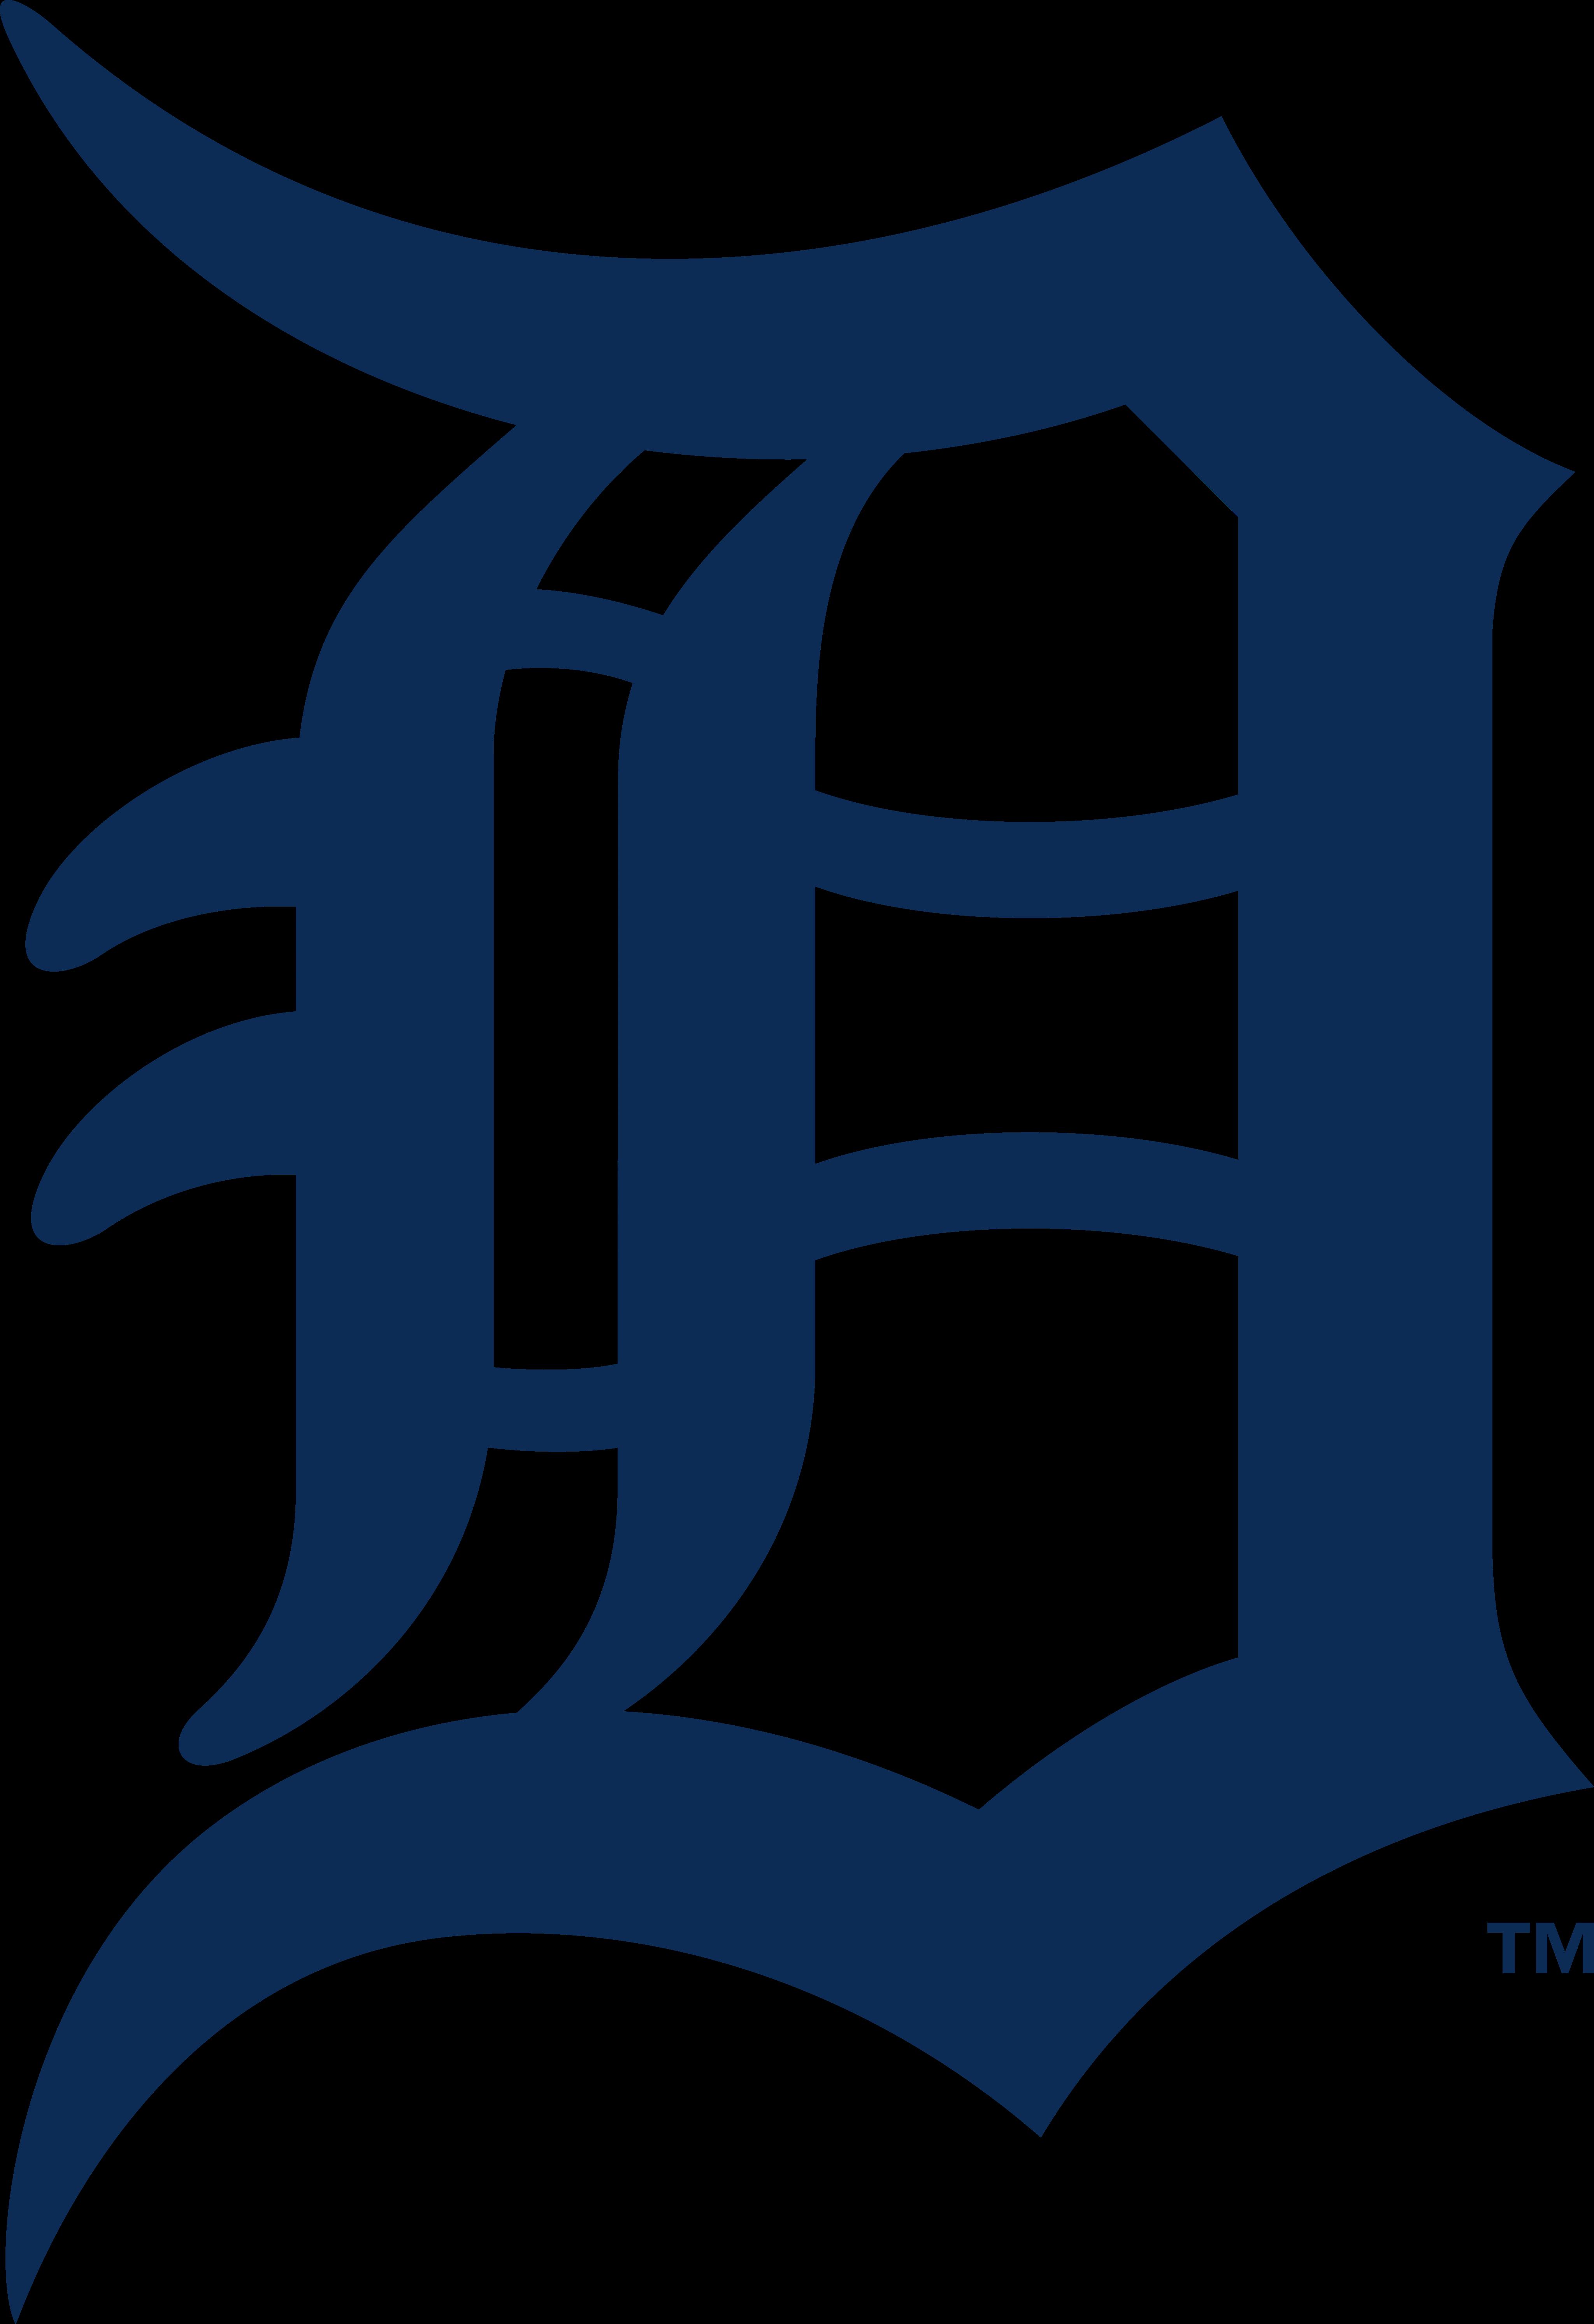 Detroit Tigers Logo.